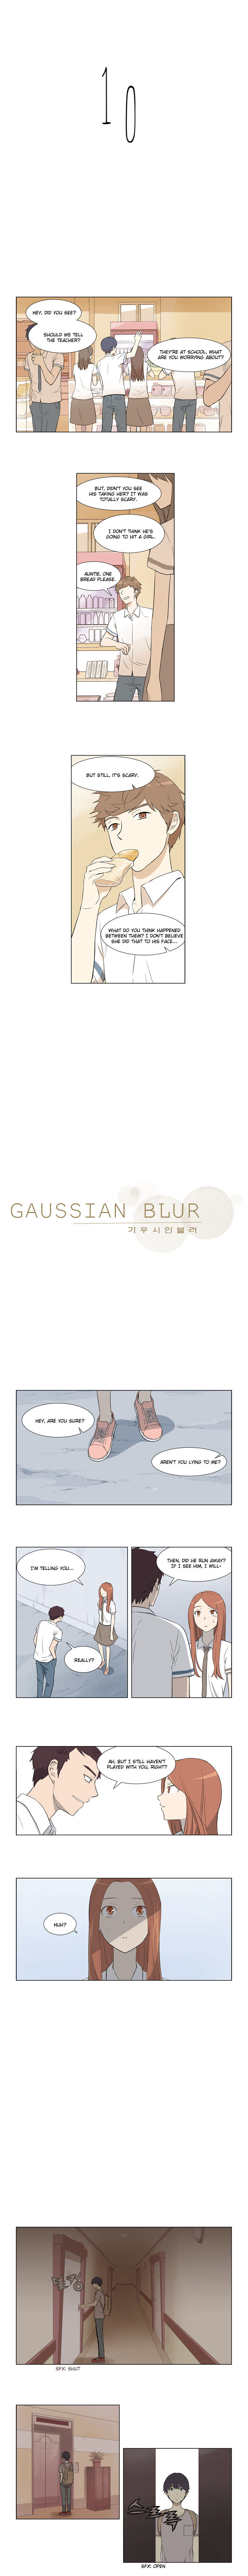 Gaussian Blur 10 Page 2